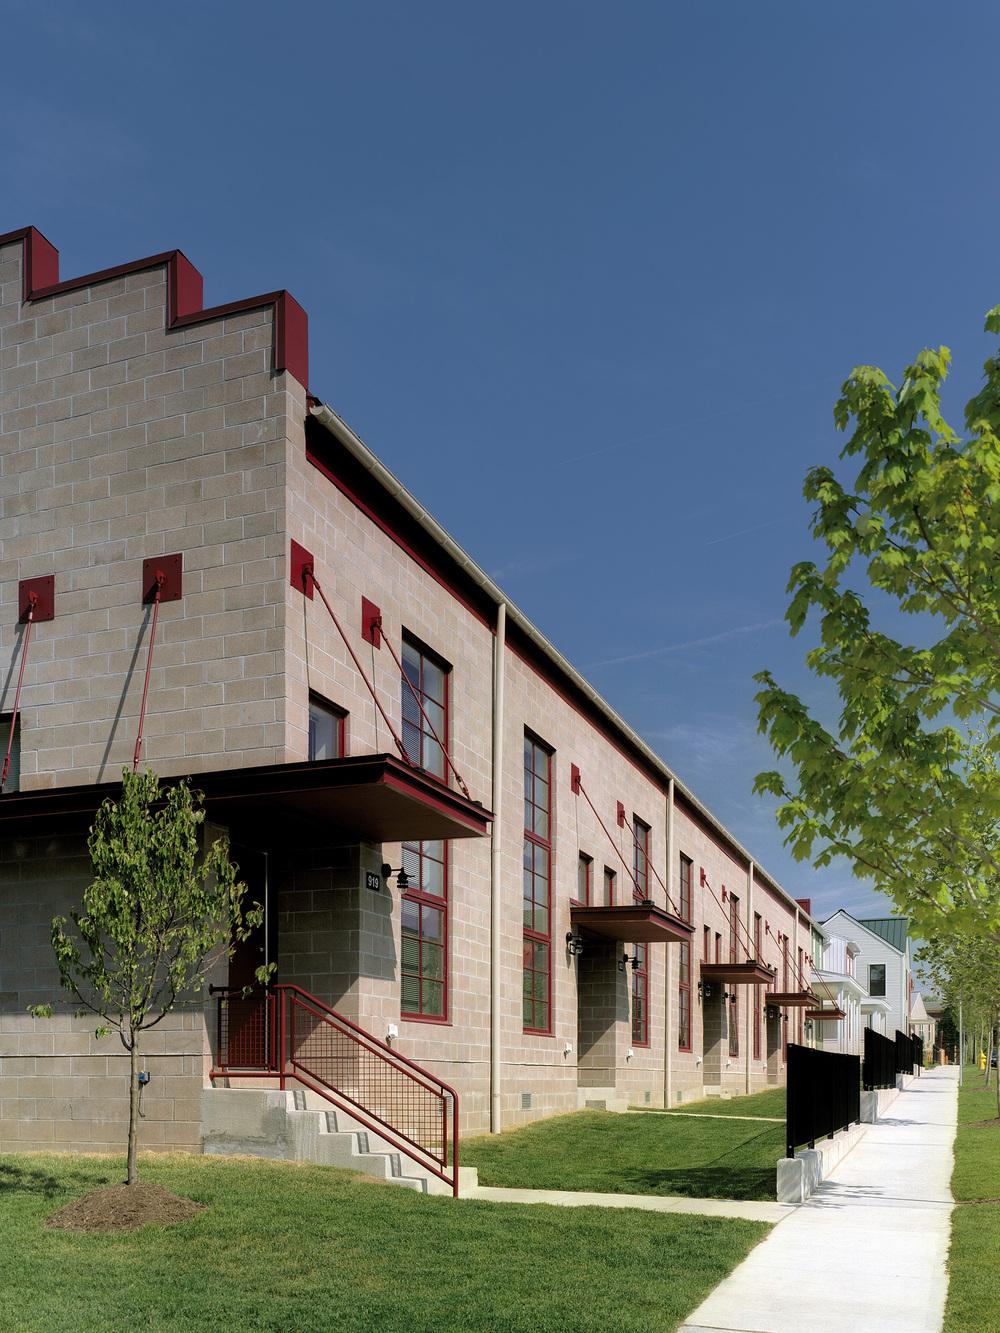 9AIA-HUD 32 factory loft building-feinknopf.jpg